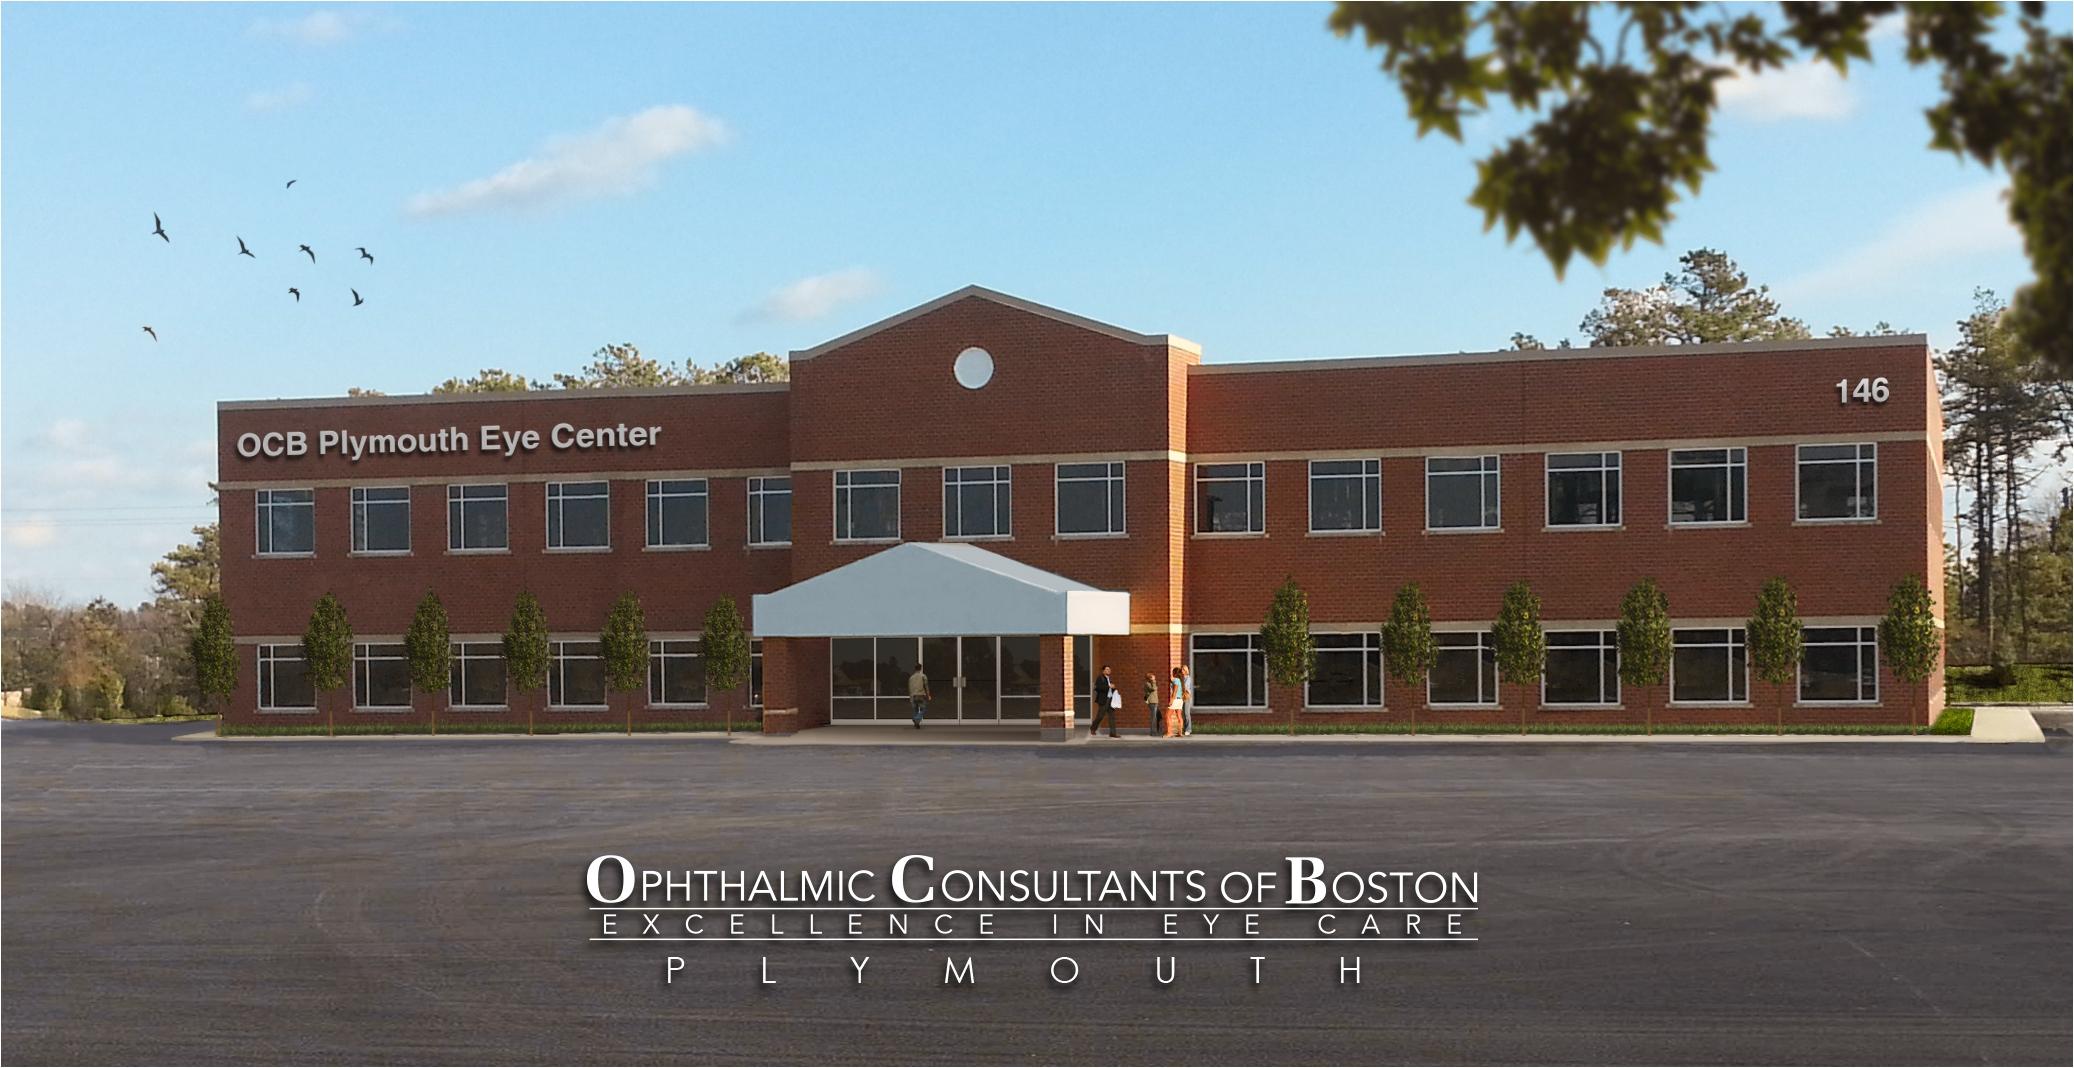 ocb plymouth